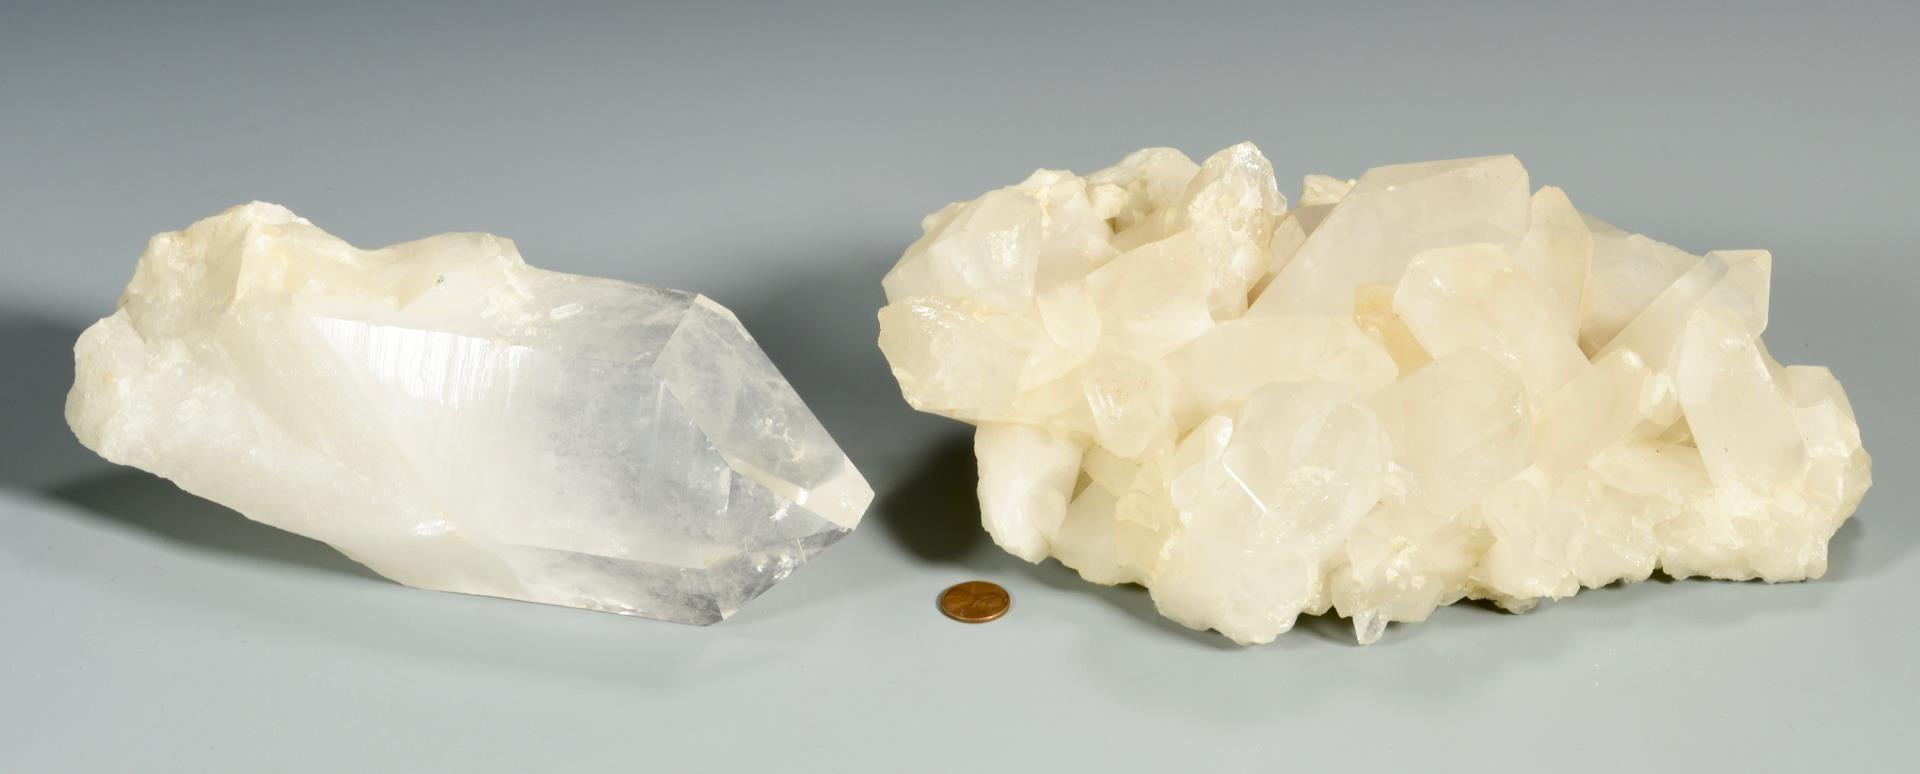 Lot 223: 4 Free Form White Quartz Crystals